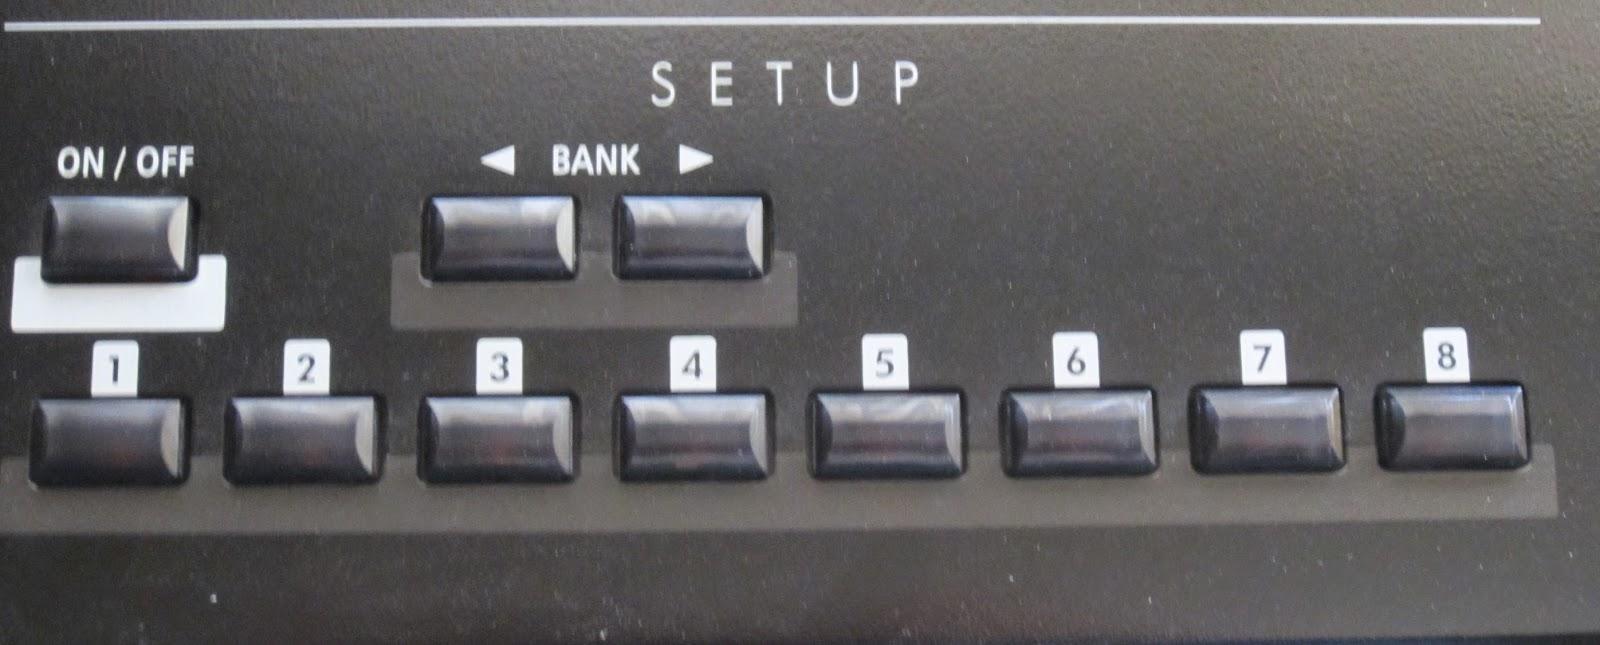 Kawai MP11 digital piano